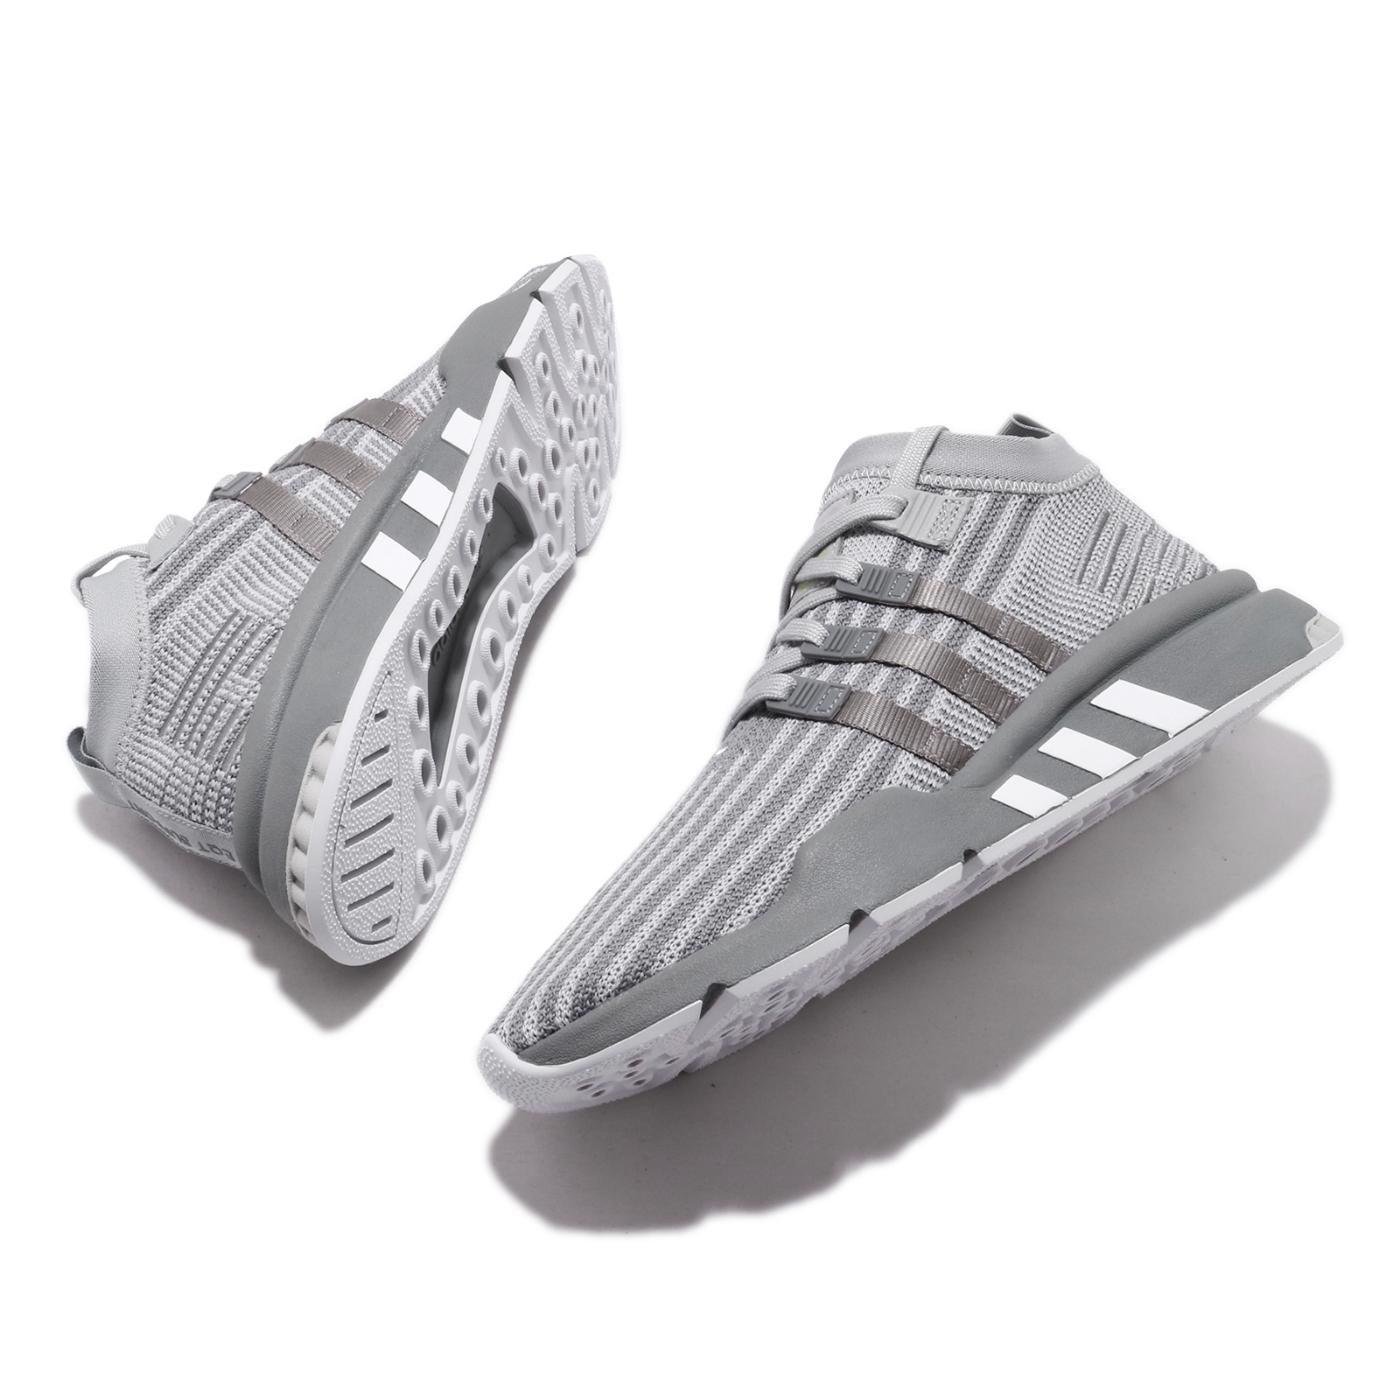 adidas 休閒鞋 EQT Support Mid ADV 男鞋 愛迪達 三葉草 襪套式 流行款 穿搭推薦 灰 白 B37407